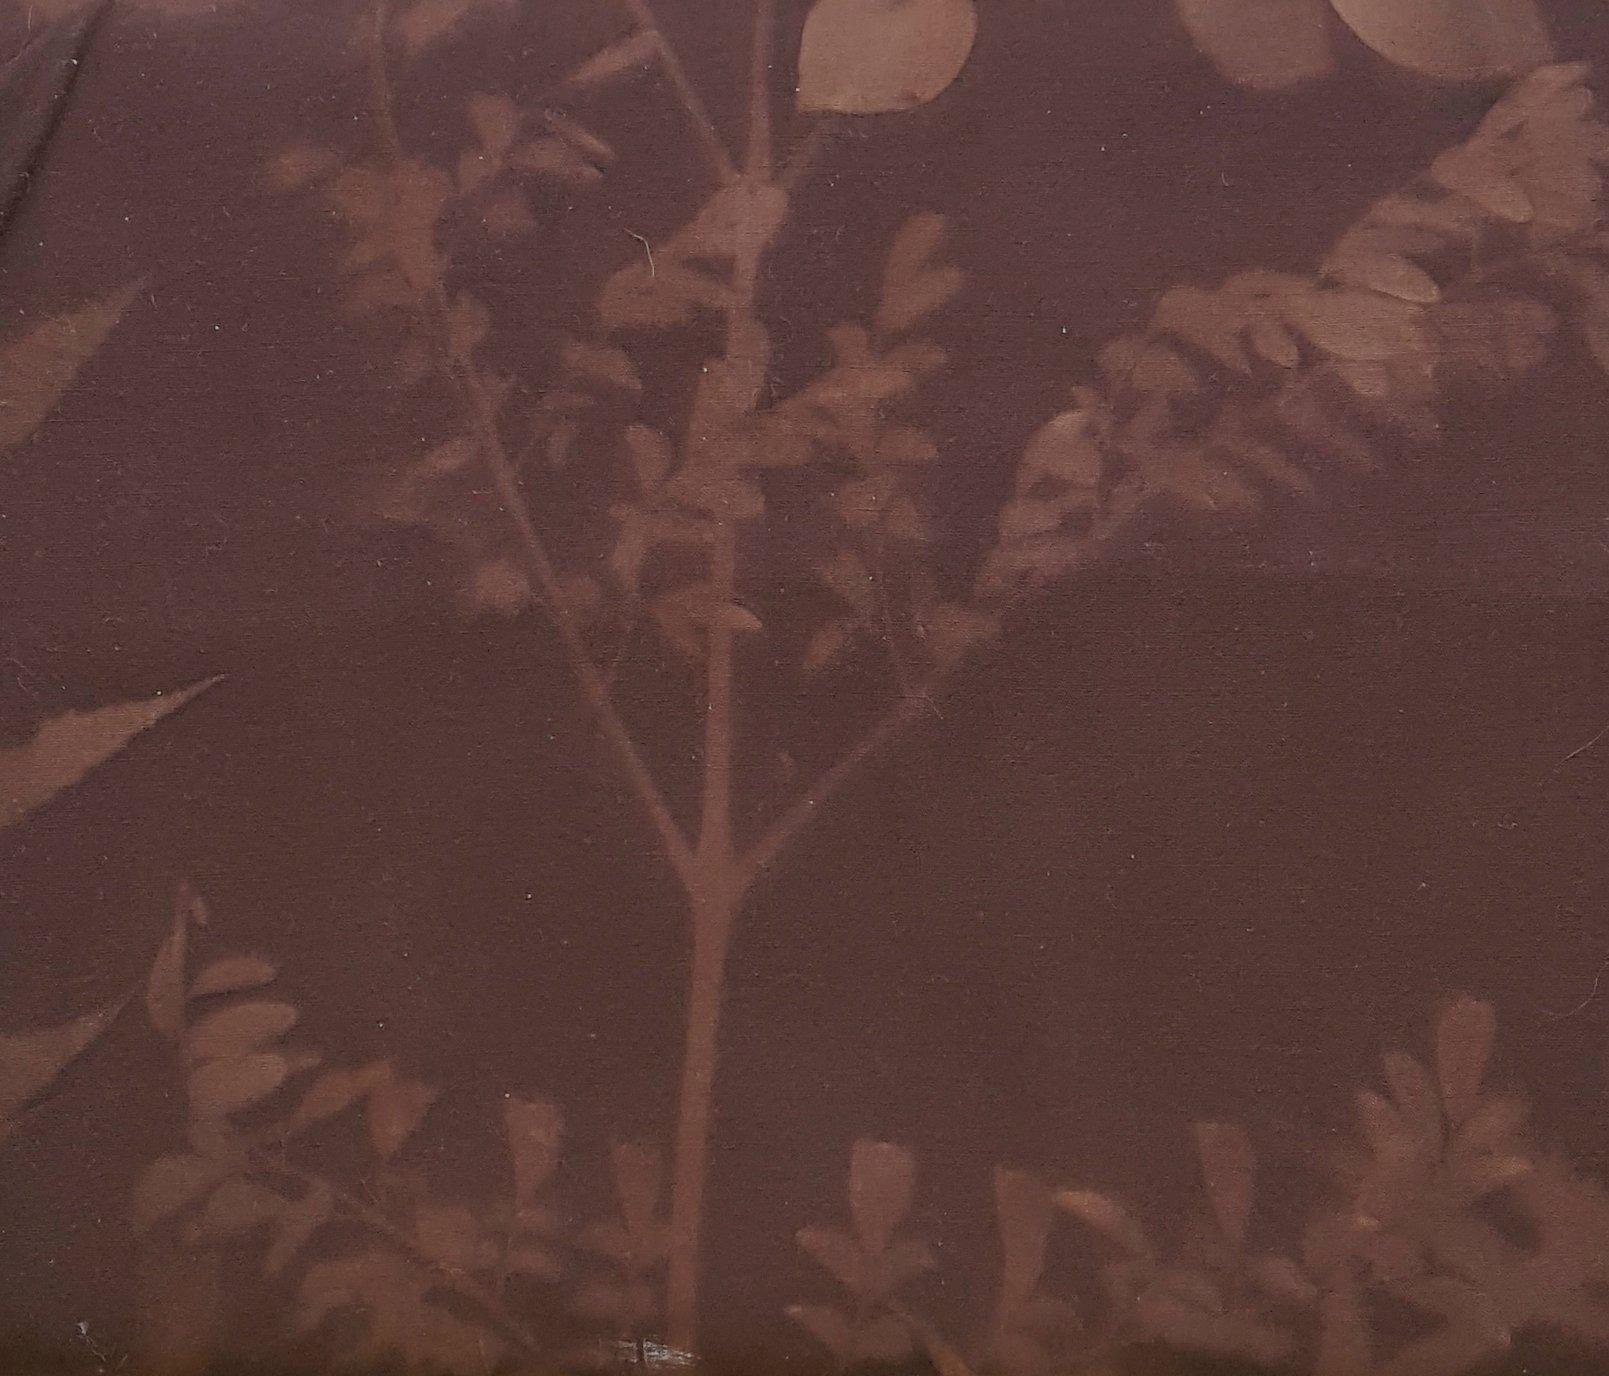 1956S Batik Textiles - brown leaf